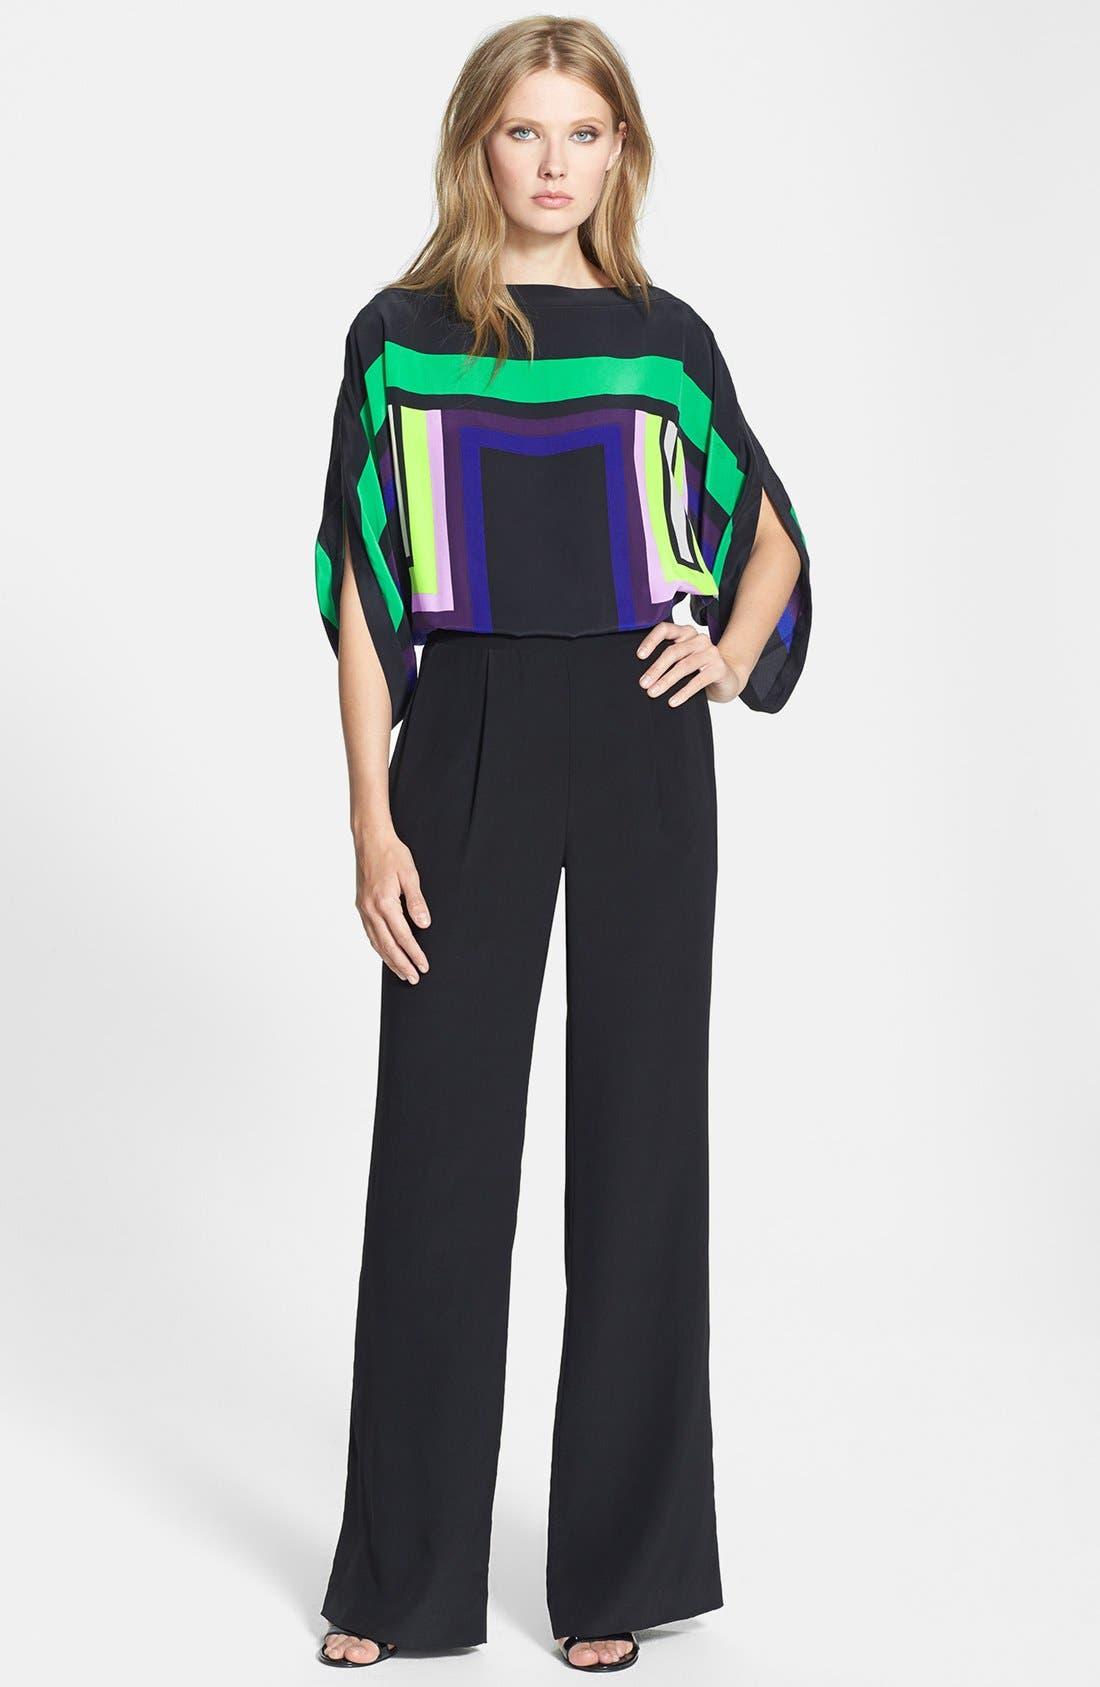 Alternate Image 1 Selected - Diane von Furstenberg 'Lucy' Print Top Silk Jumpsuit